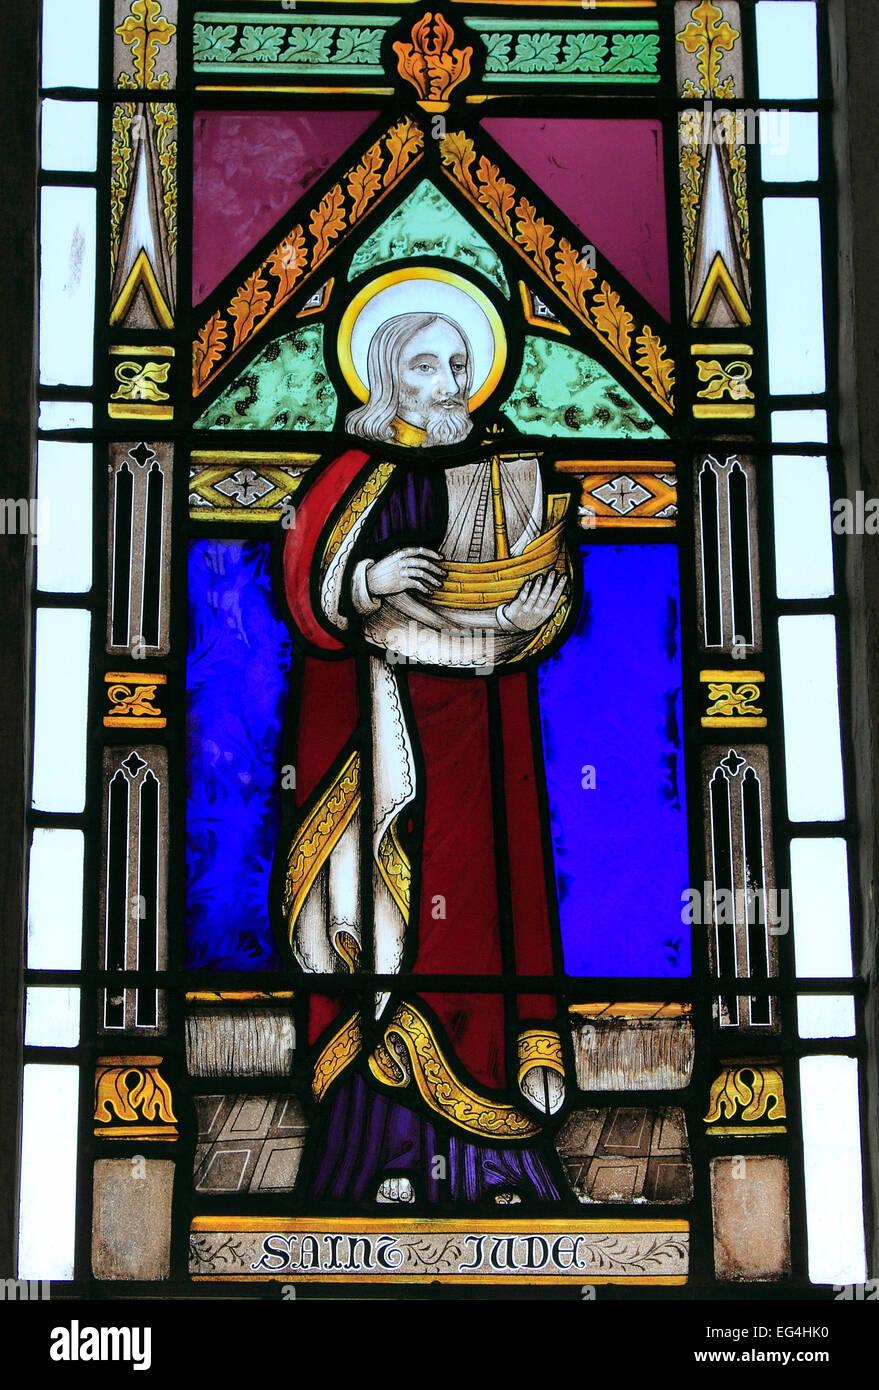 St. Jude, stained glass window, by Joseph Grant, c. 1855 Wighton, Norfolk England UK saint saints - Stock Image